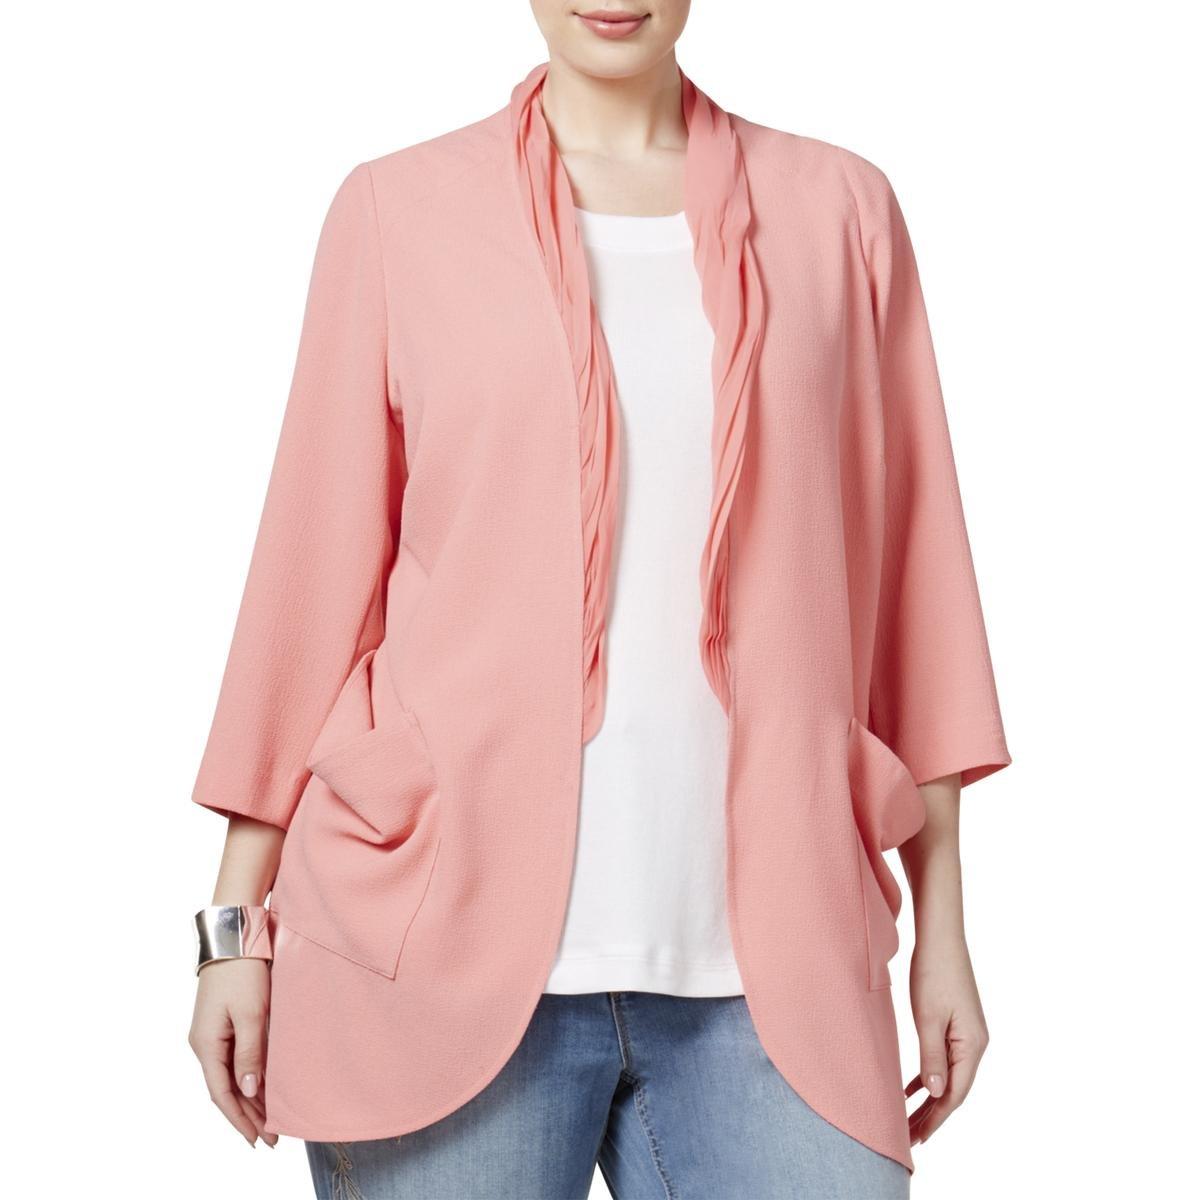 Melissa McCarthy Seven7 Womens Plus Chiffon Trim Long Sleeves Cardigan Top M7W5152